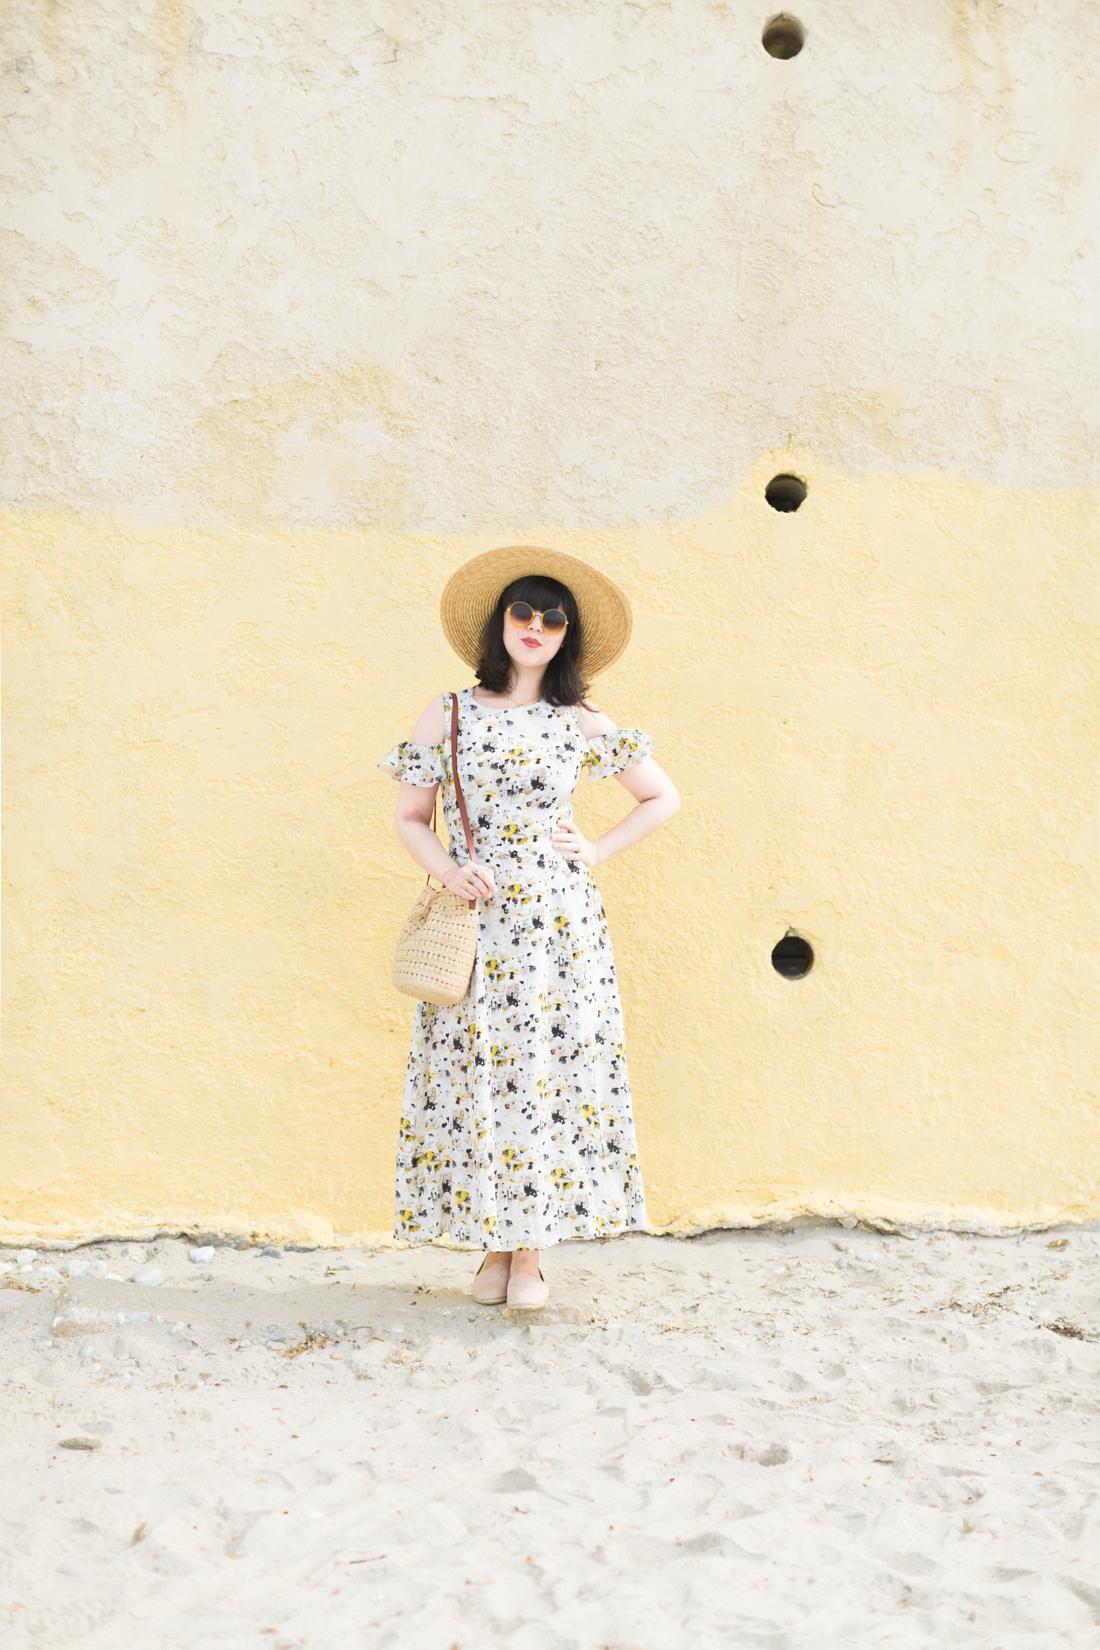 yellow_dress_flowers_kelly_love_youngbritishdesigners_copyright_Pauline_Privez_paulinefashionblog_com-2